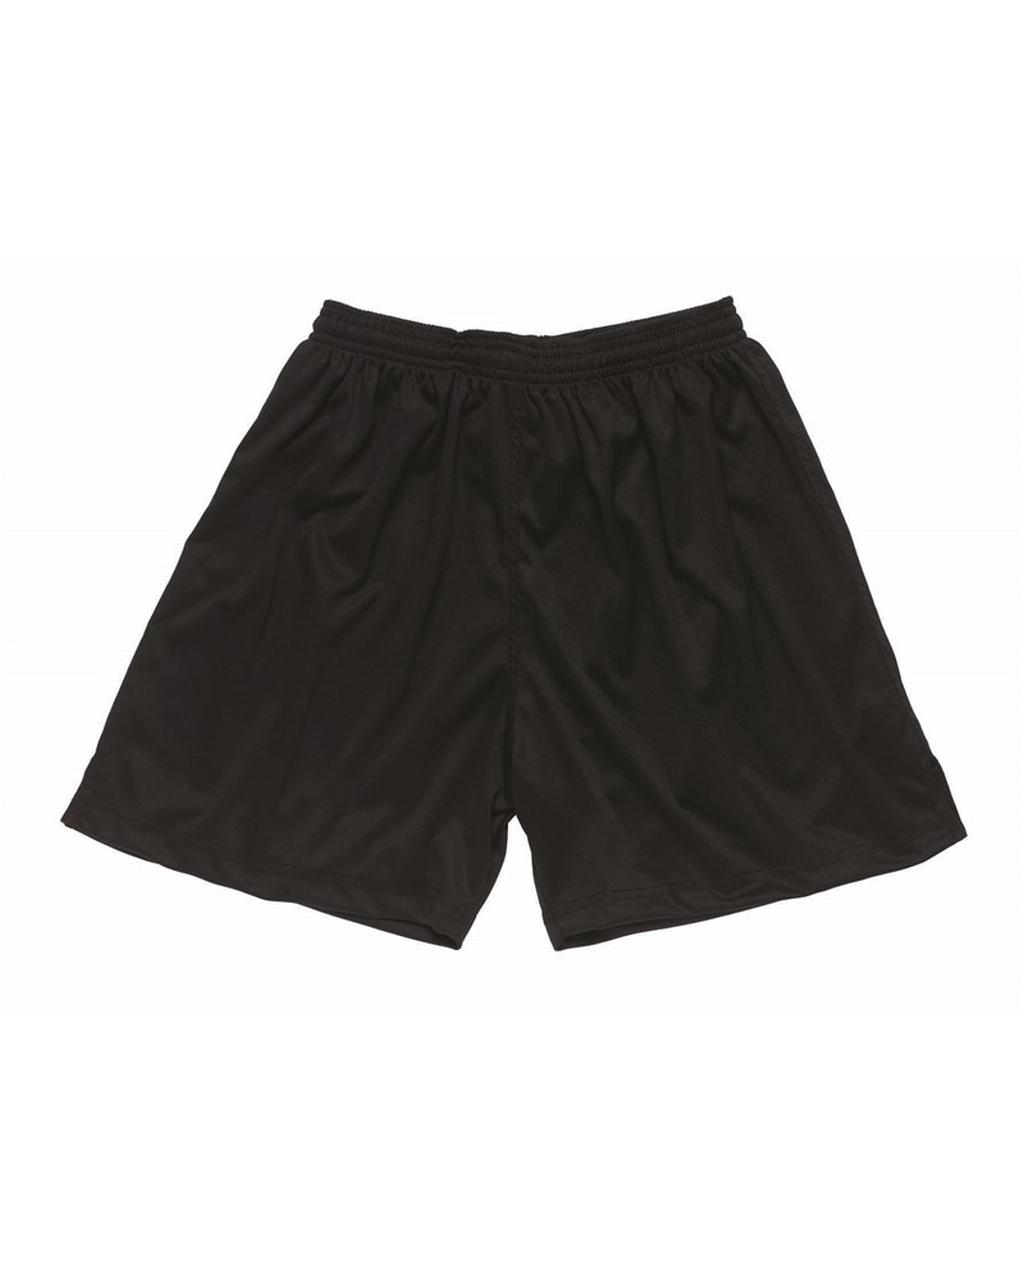 Sports Shorts - 30/32